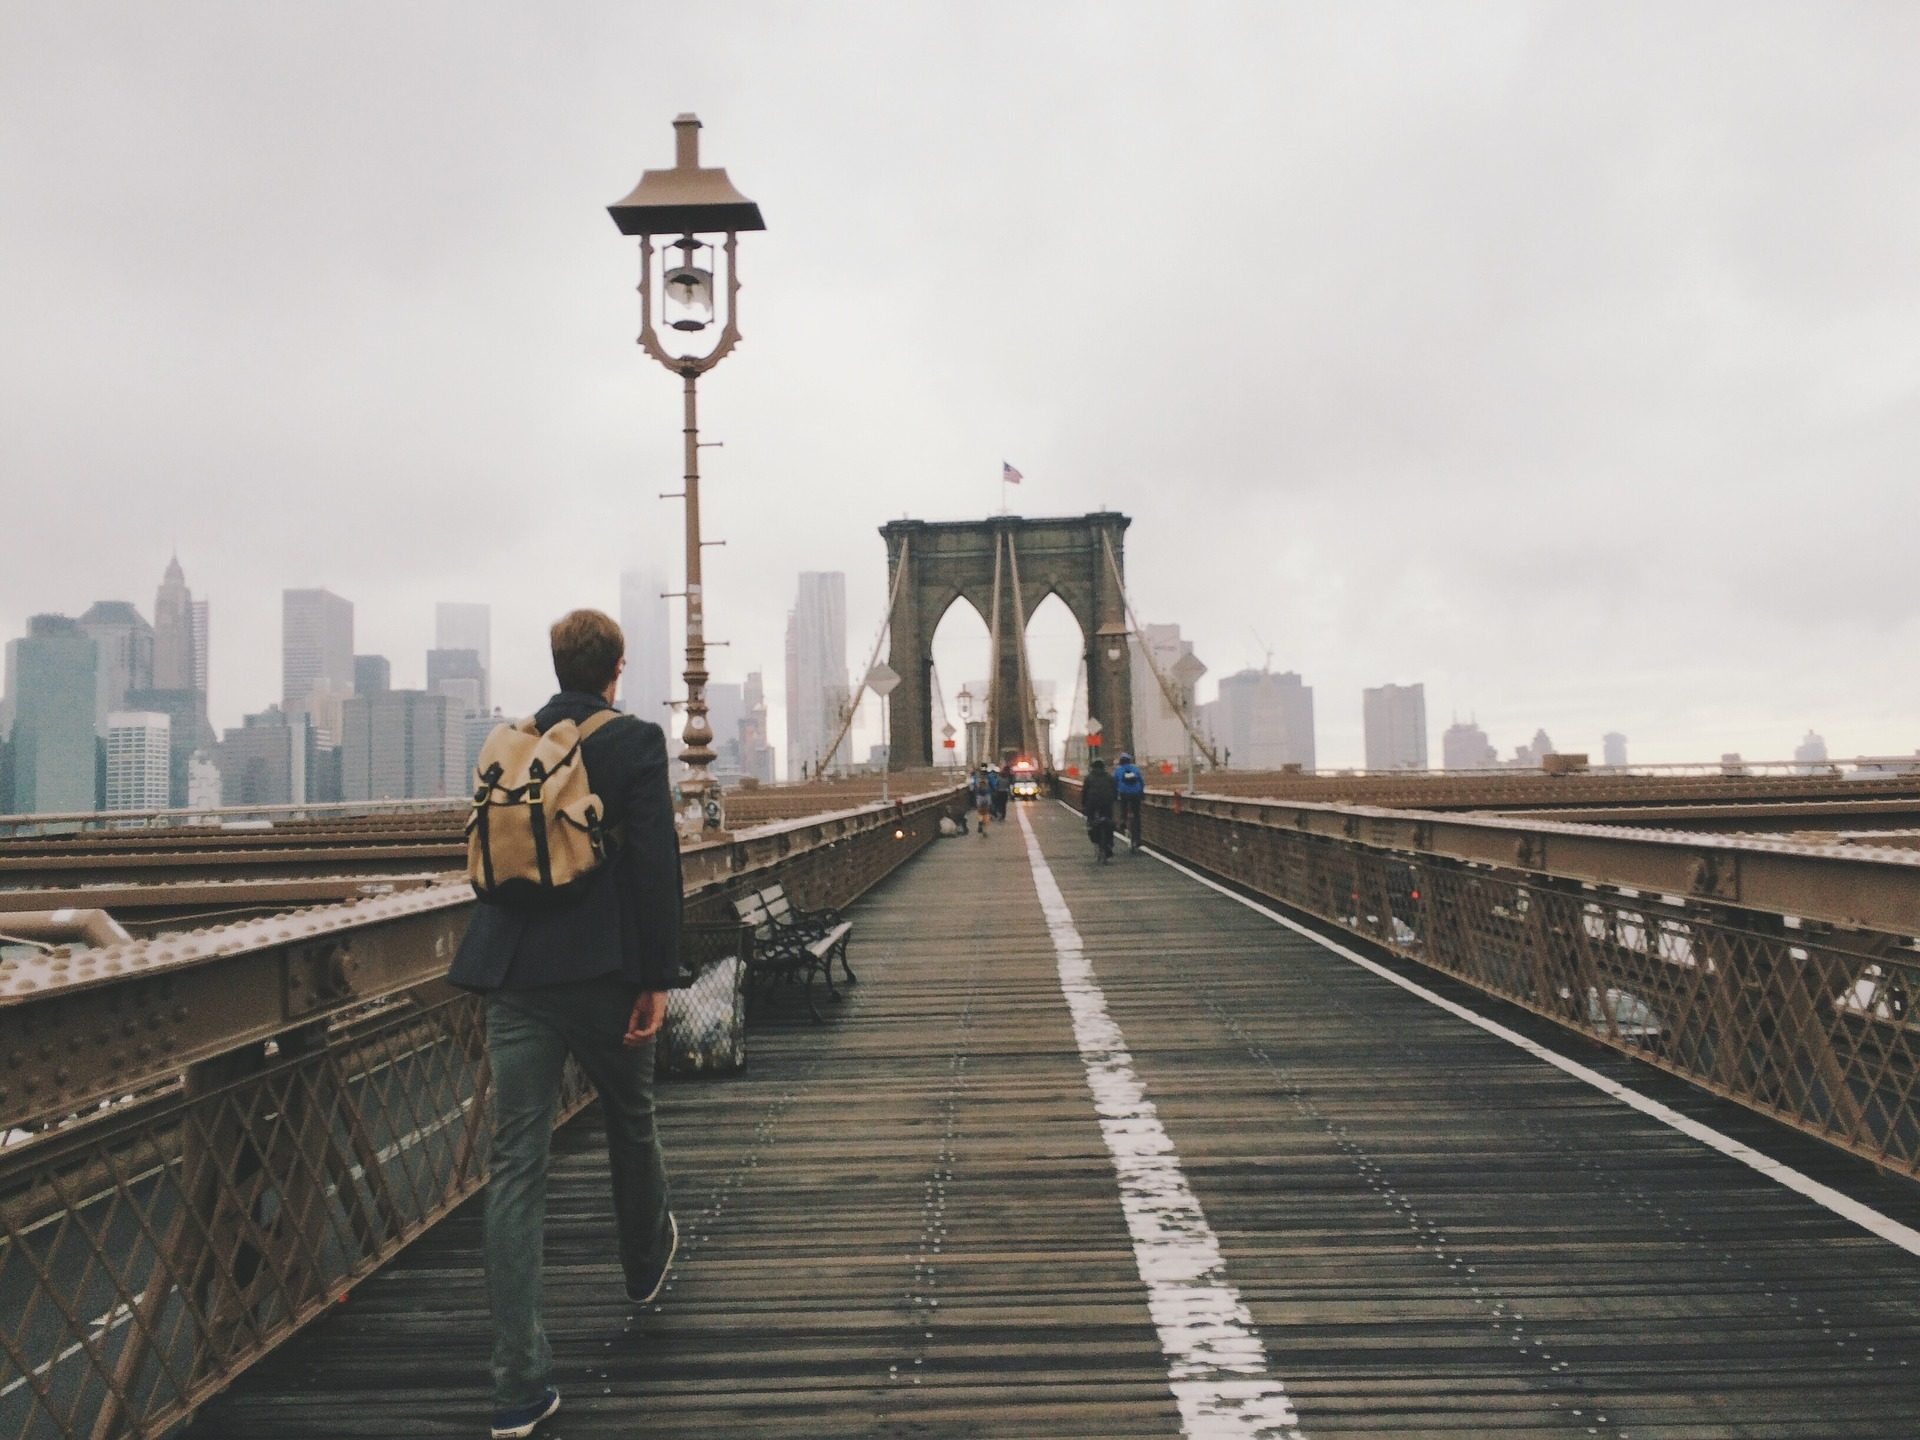 आदमी, बैग, पुल, शहर, ब्रुकलिन, न्यू यार्क - HD वॉलपेपर - प्रोफेसर-falken.com